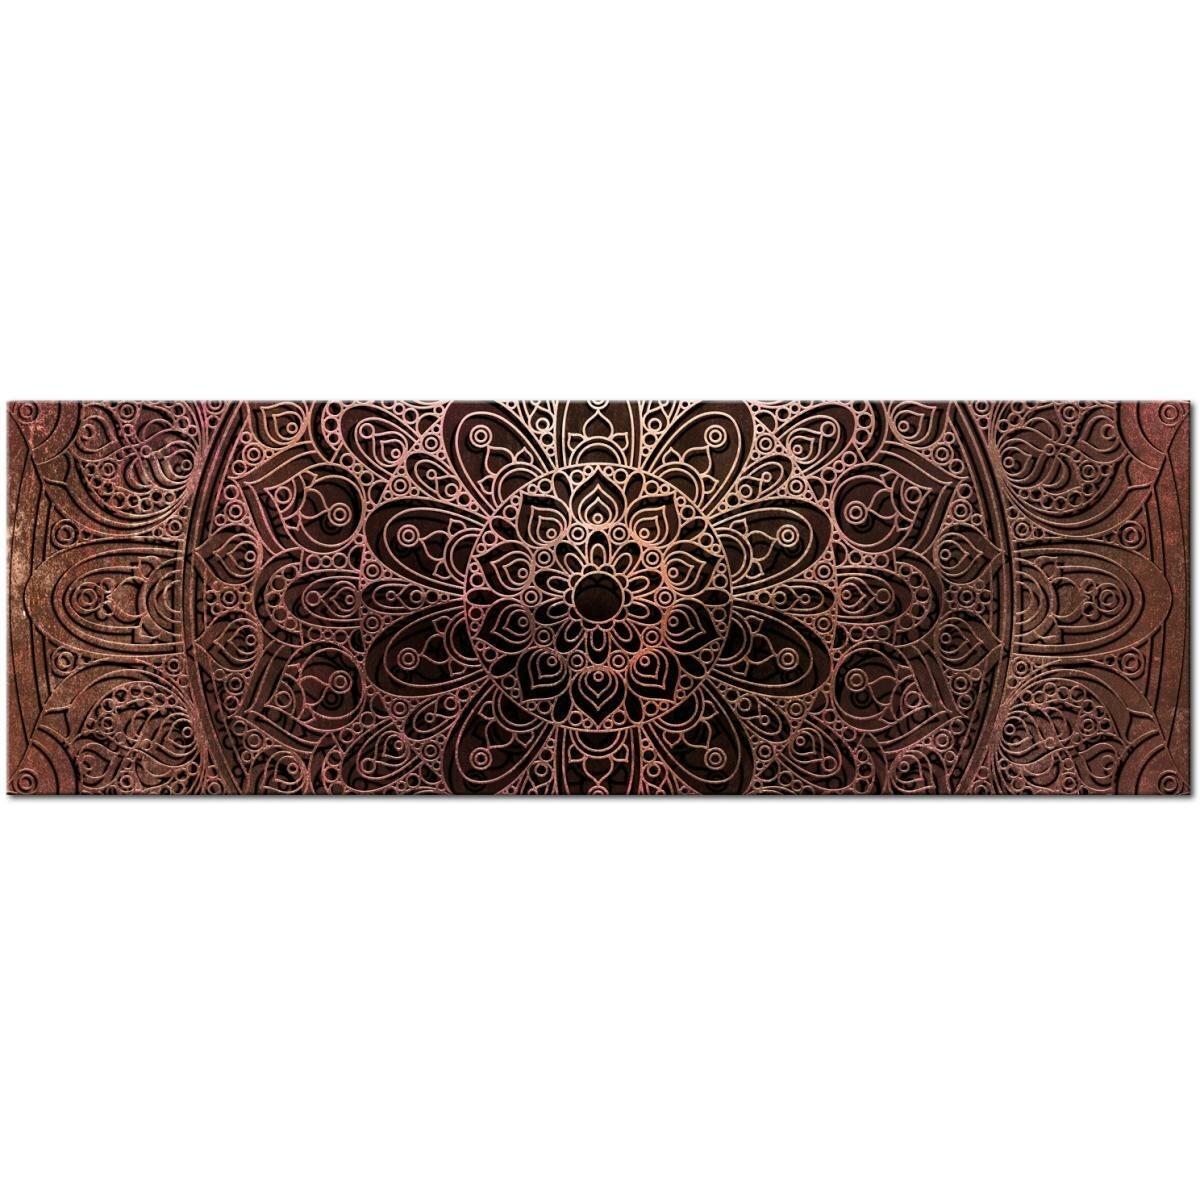 East Urban Home Mandala Amber Silence Graphic Art On Wrapped Canvas Wayfair Co Uk